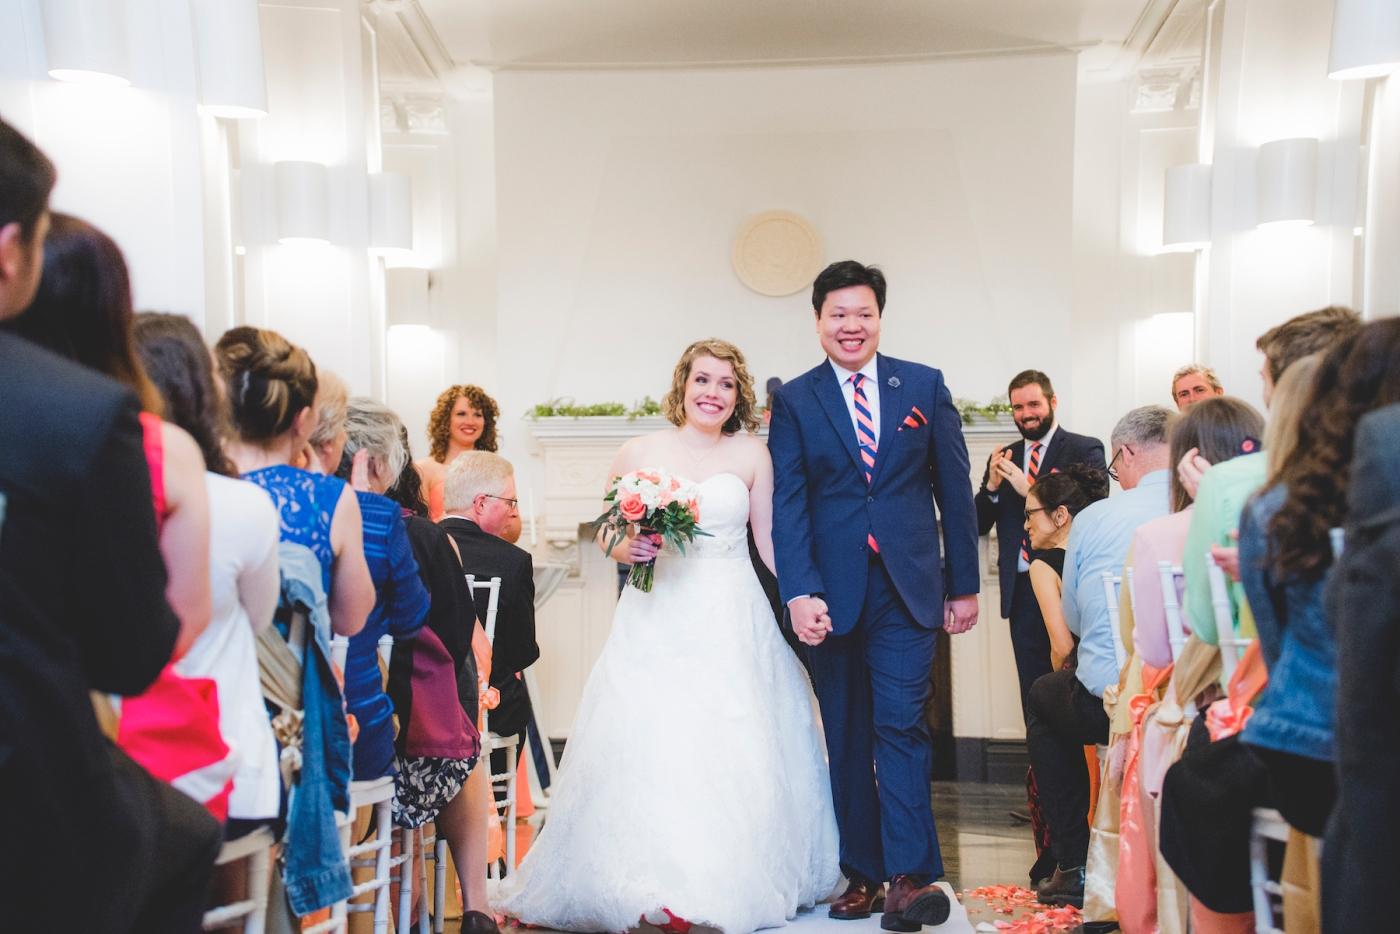 DSC_2730Everett_Wedding_Ballroom_Jane_Speleers_photography_Rachel_and_Edmund_Ceremony_2017